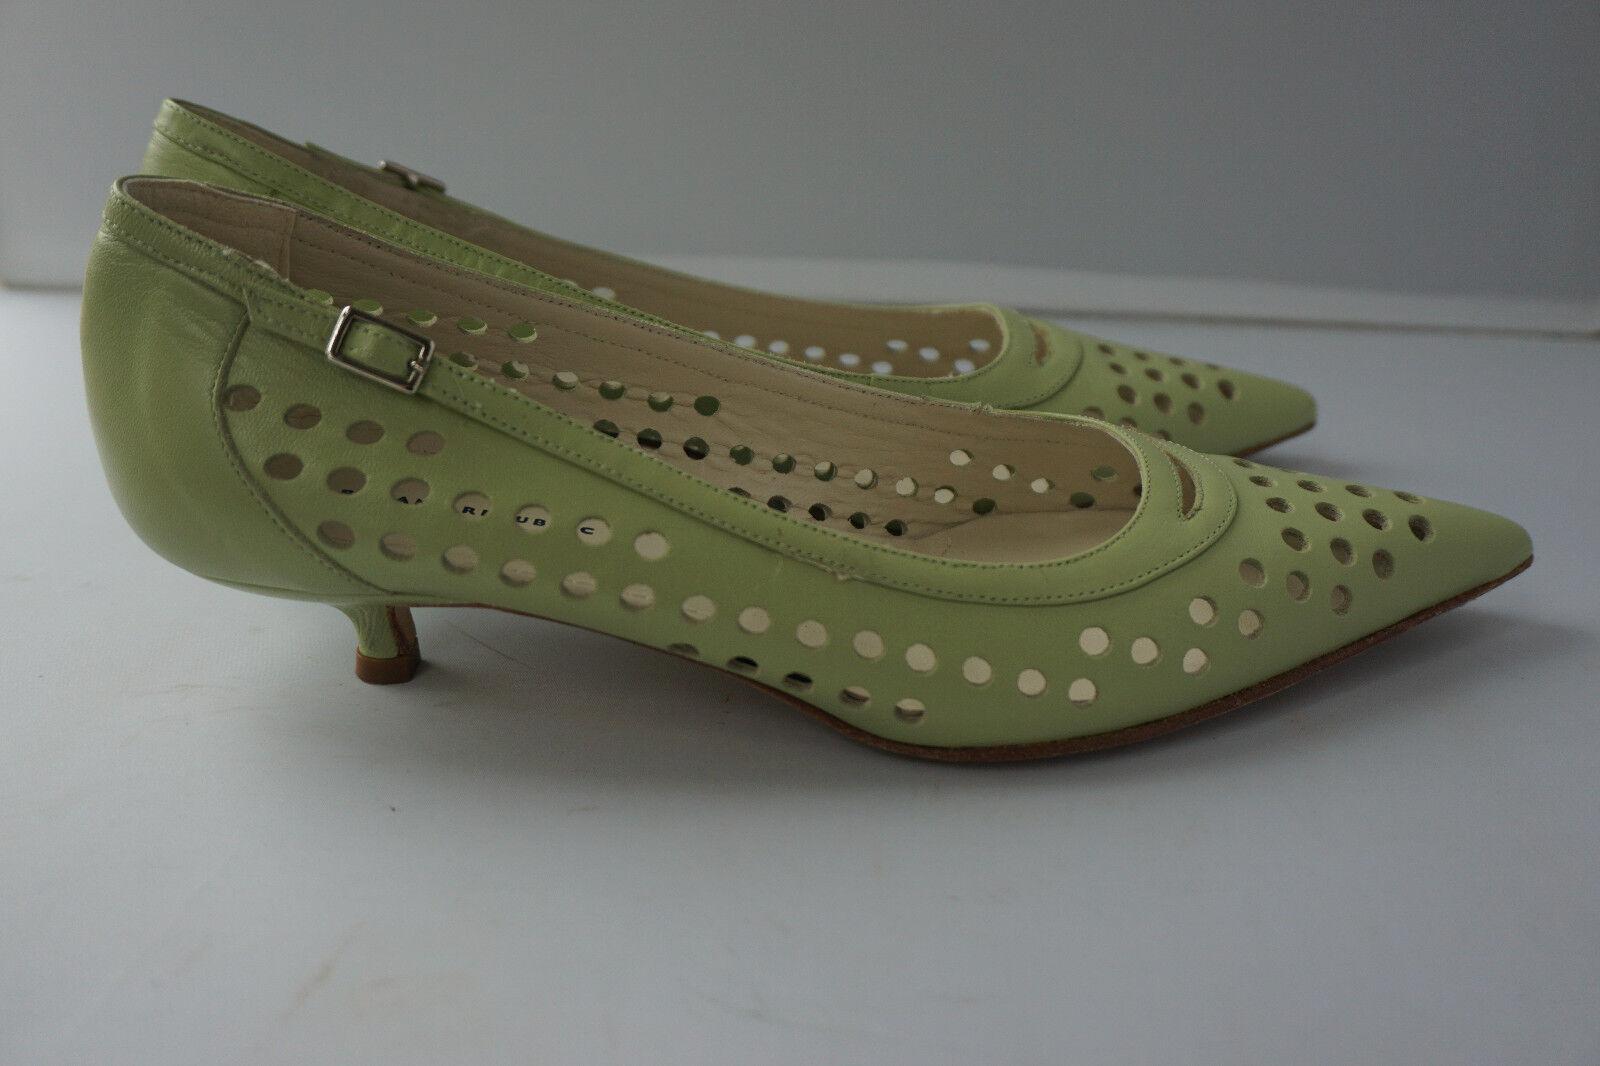 Banana Republic femmes vert Leather Kitten Heels Taille 6.5 Made in